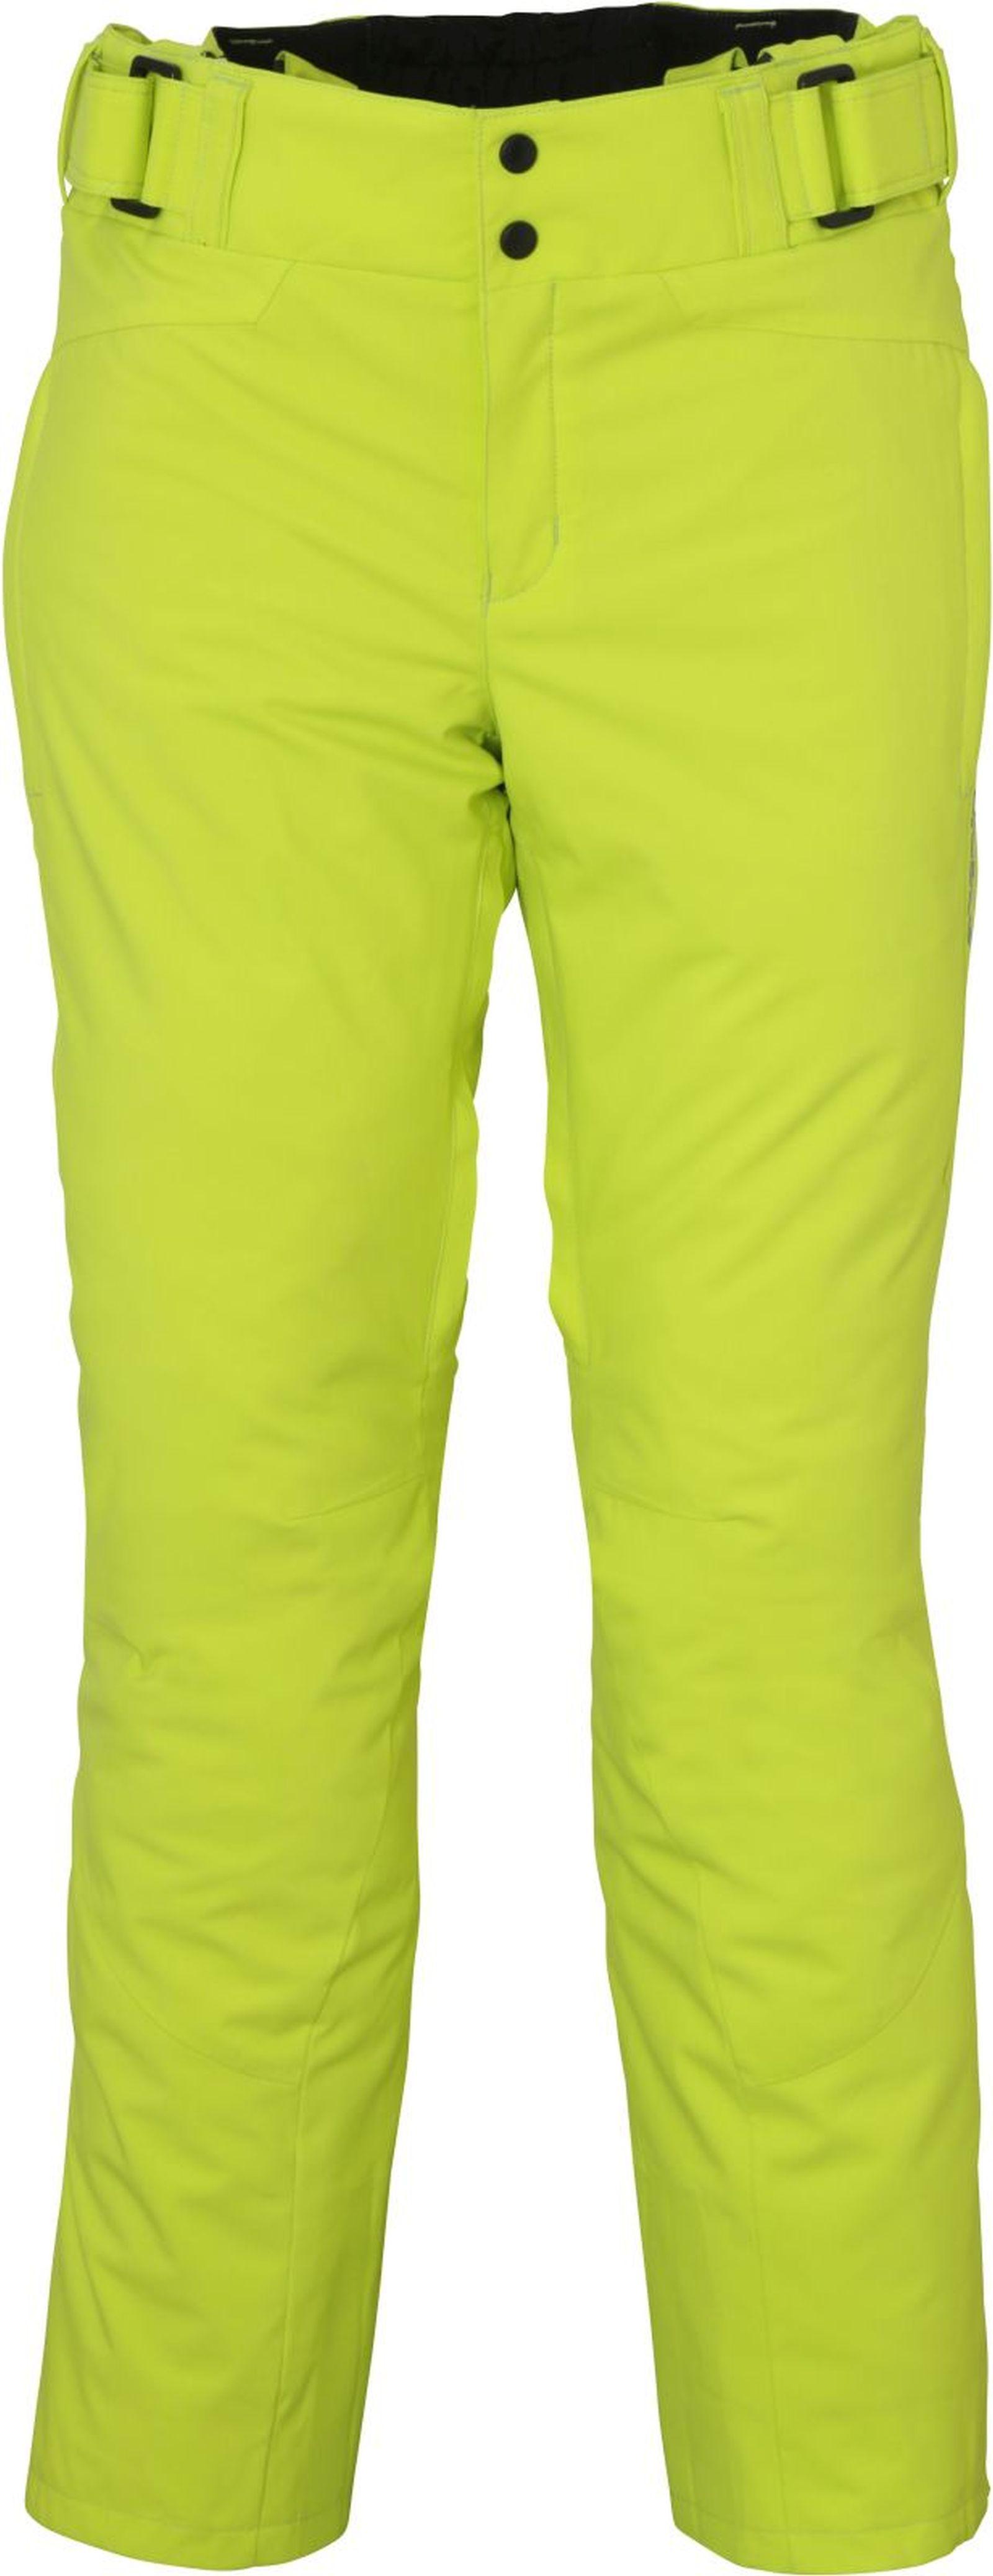 Phenix Arrow Salopette - yellow green XXL